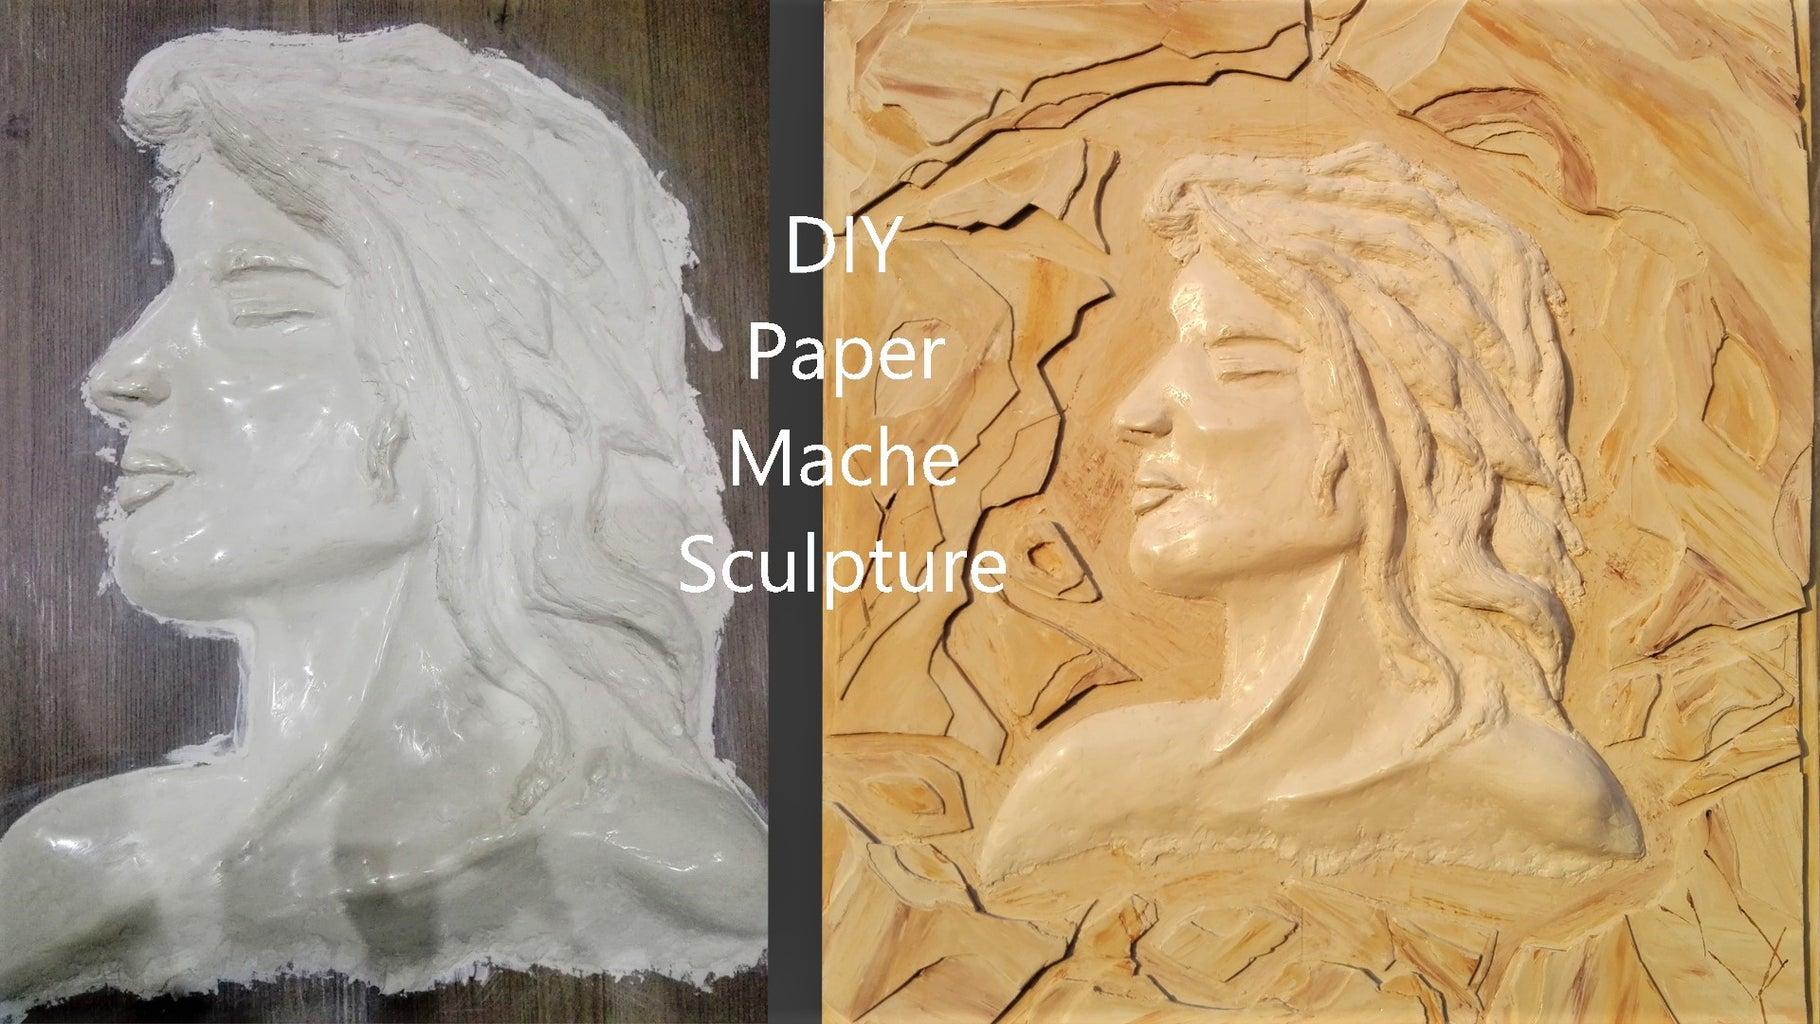 DIY Paper Mache Sculpture Like Stone Carving